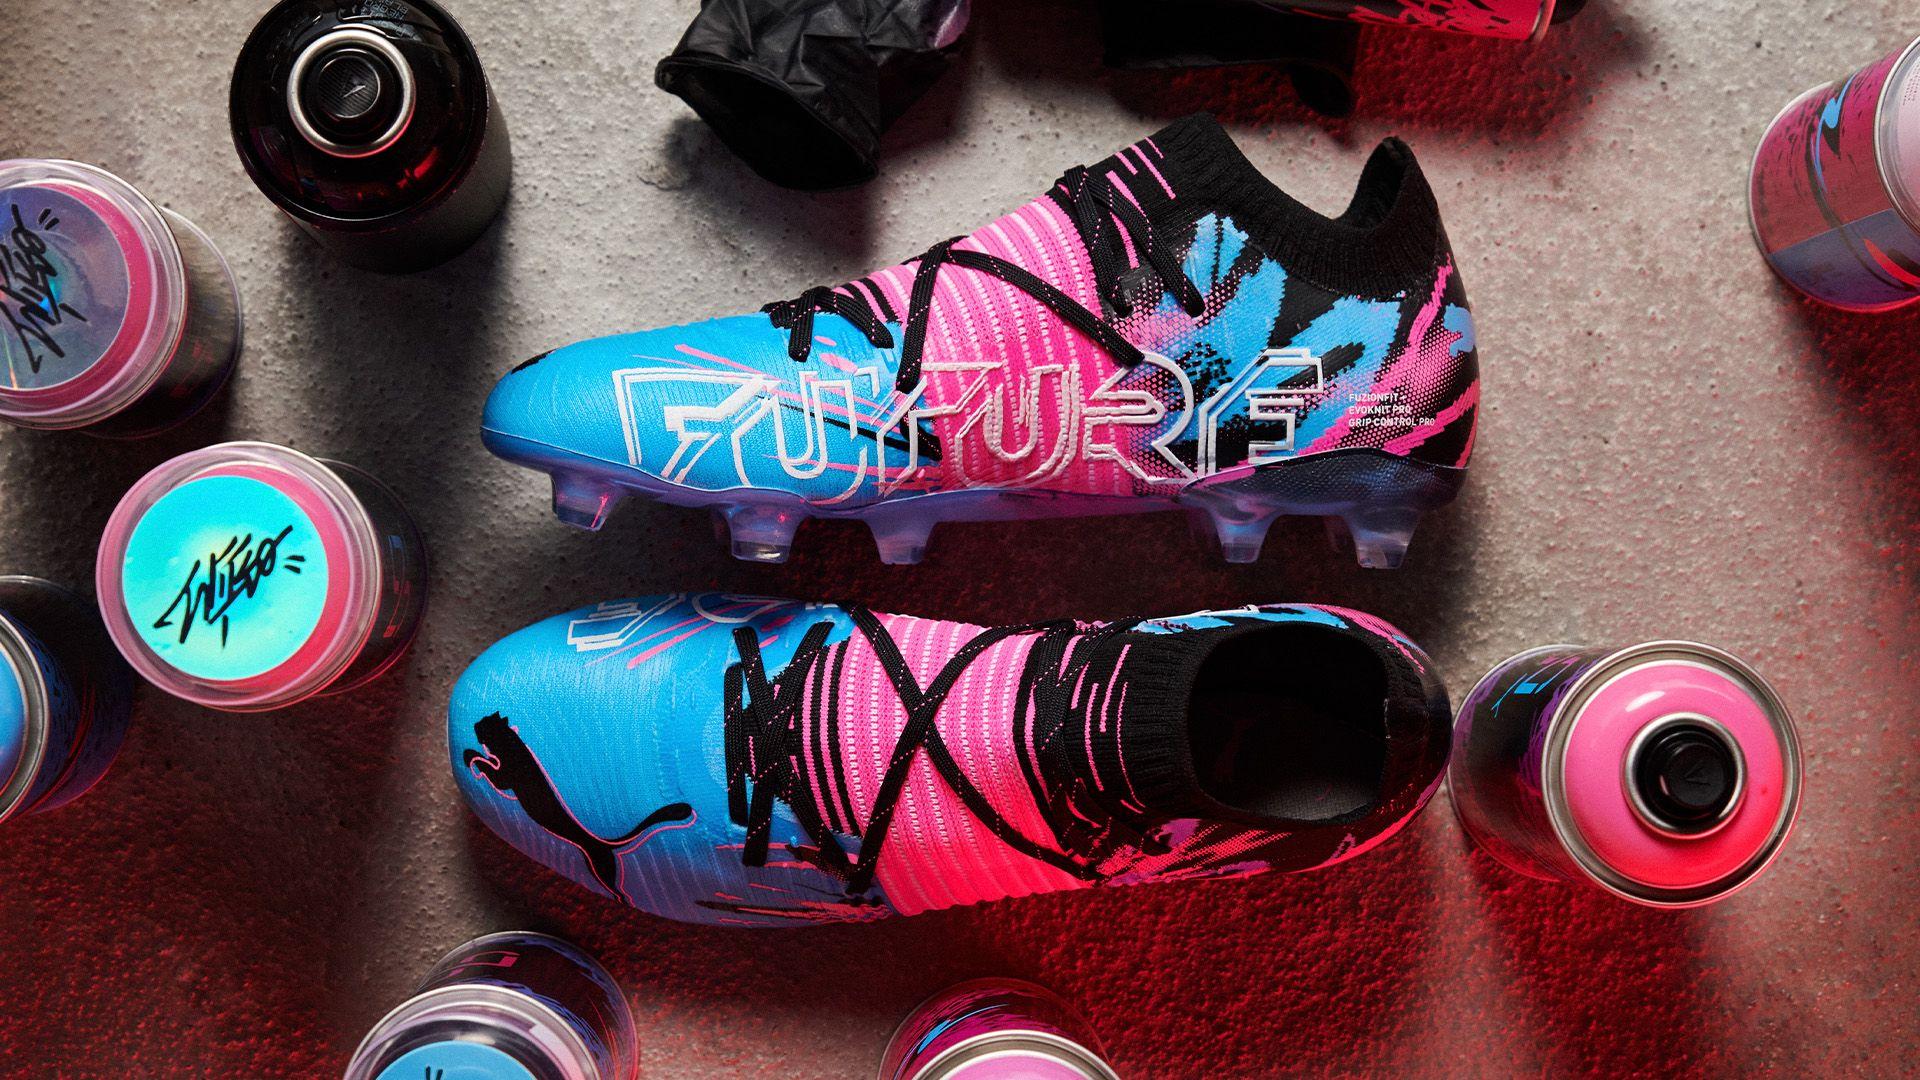 Botines Puma FUTURE Z Creativity de Neymar Jr.